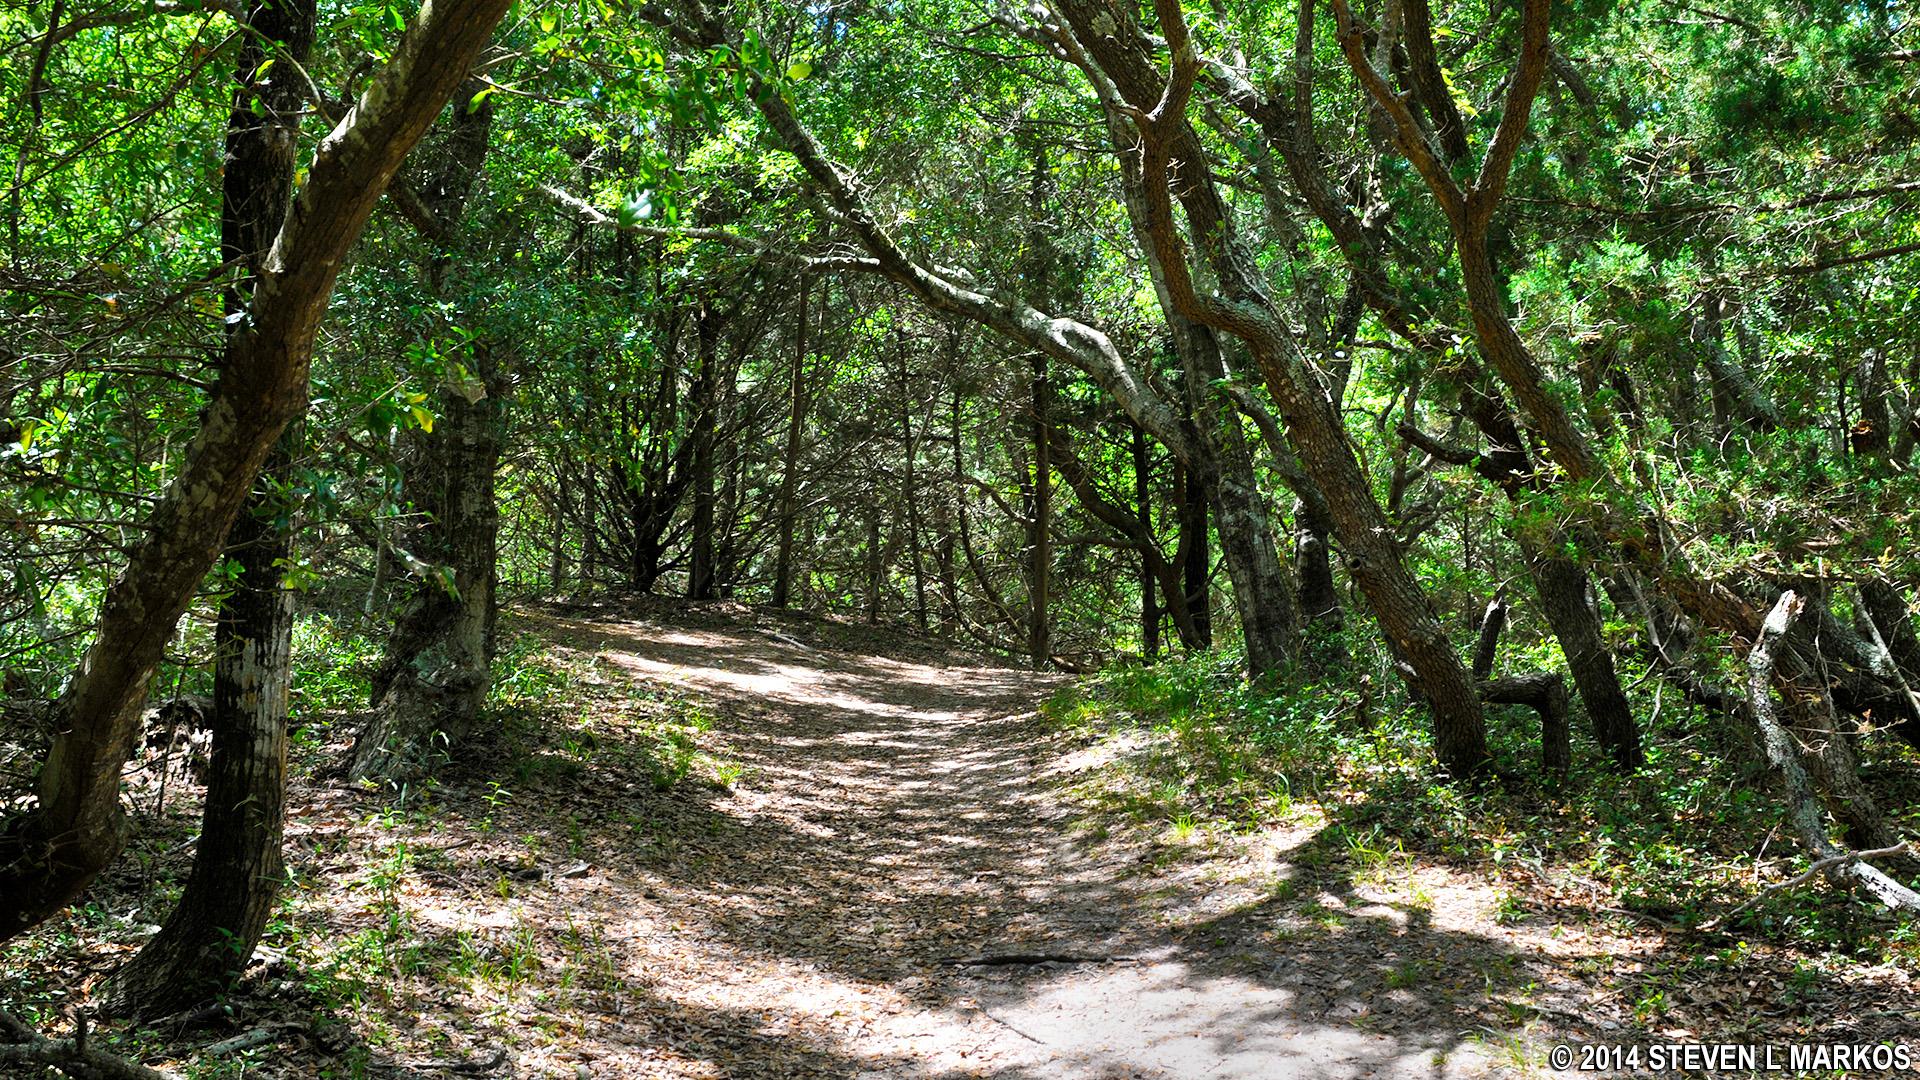 Cape Hatteras National Seashore | BUXTON WOODS TRAIL |